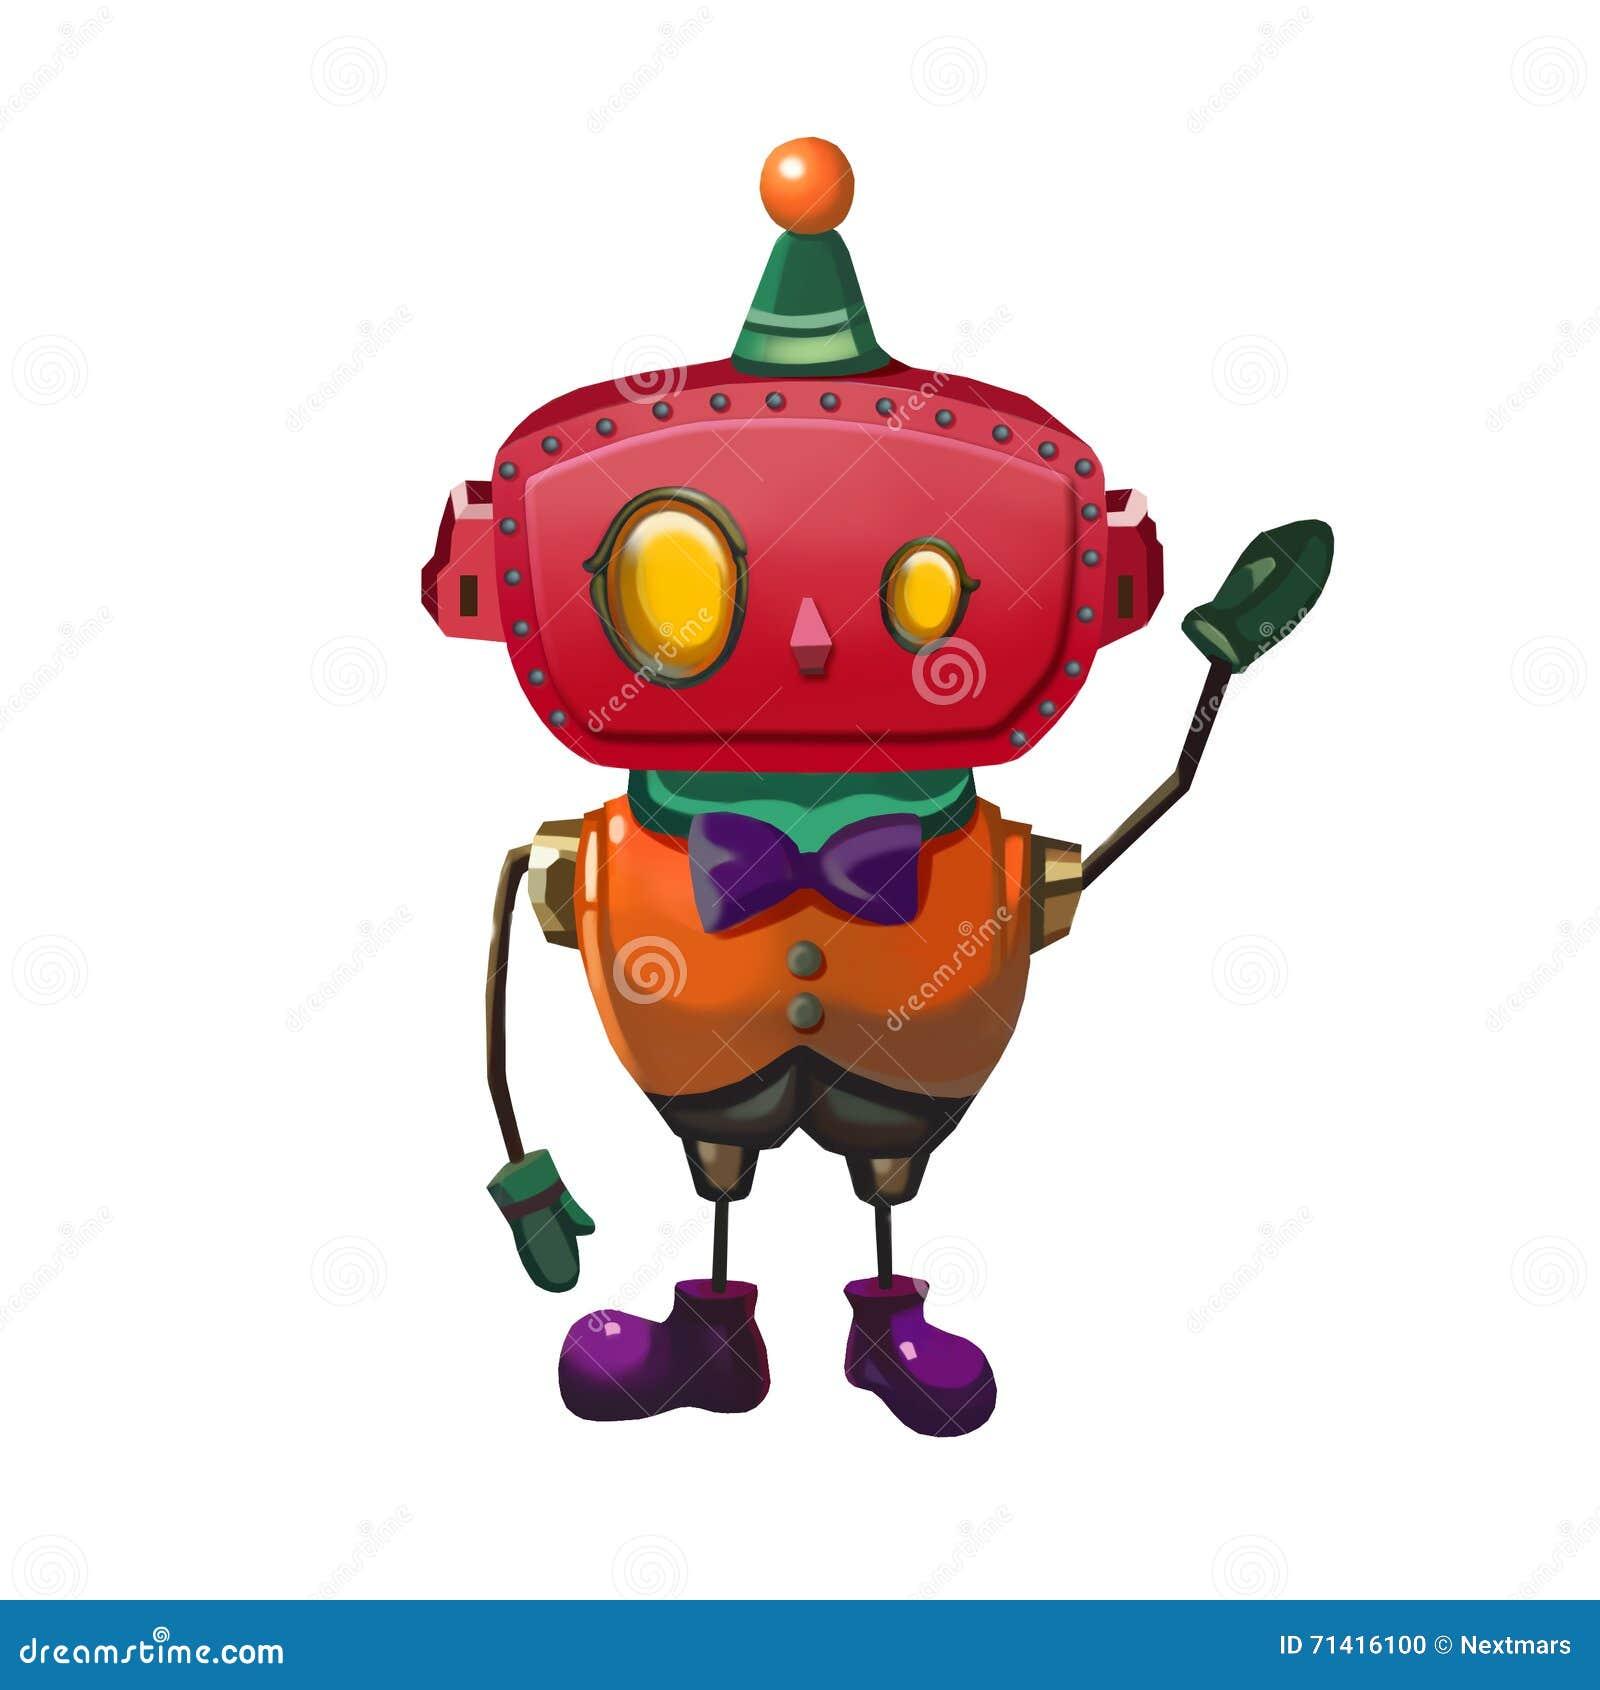 Cartoon Robot Toy : Illustration toy robot gentle man stock